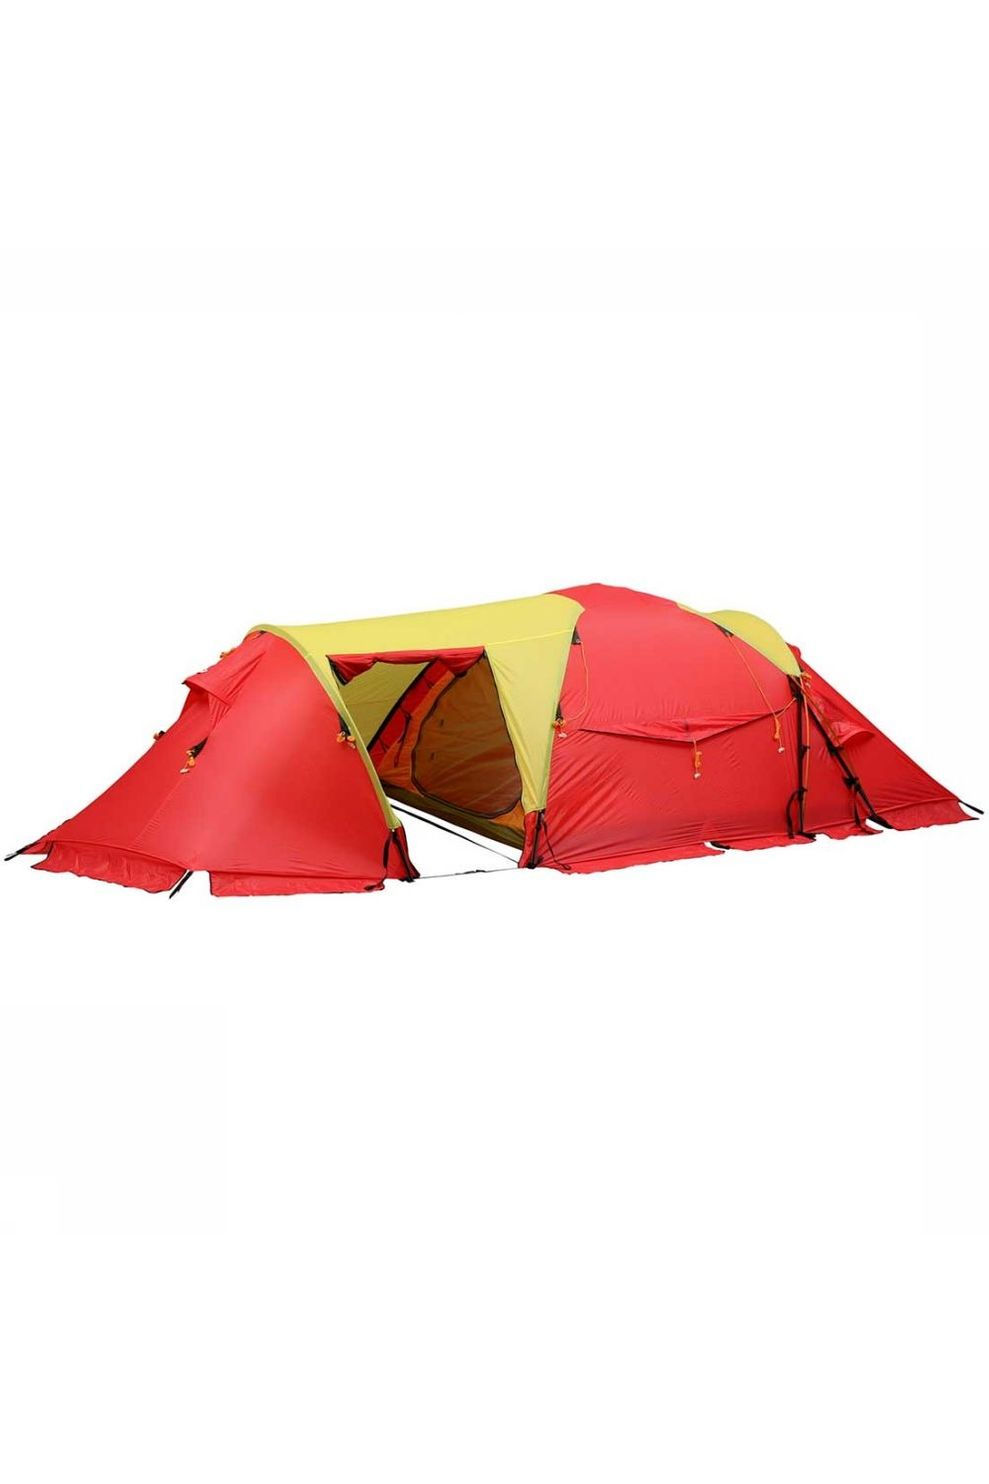 Helsport Tent Svalbard High Camp 3P Hybride tent Rood/Geel